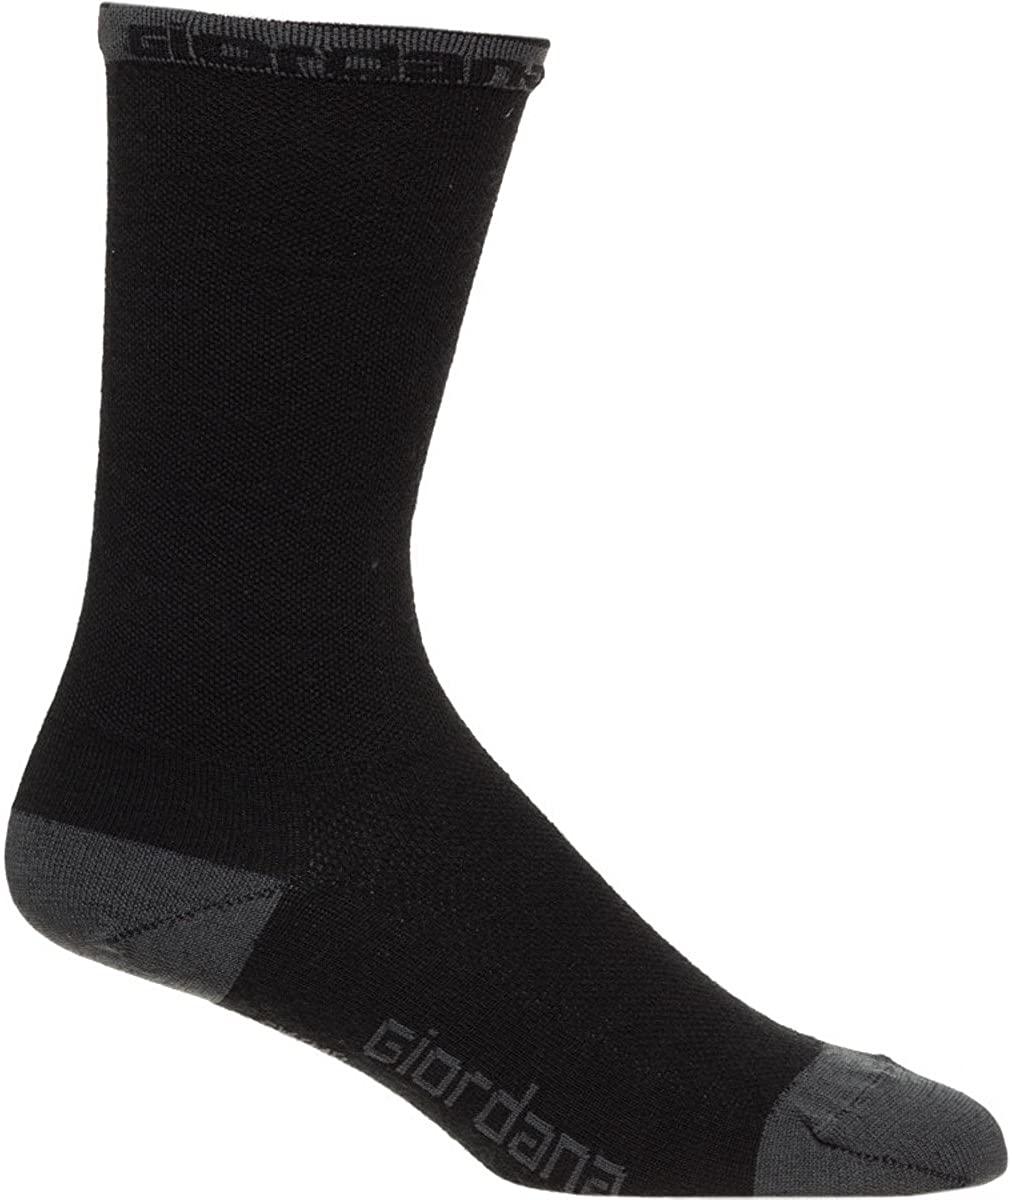 Giordana Merino 7in Wool Sock